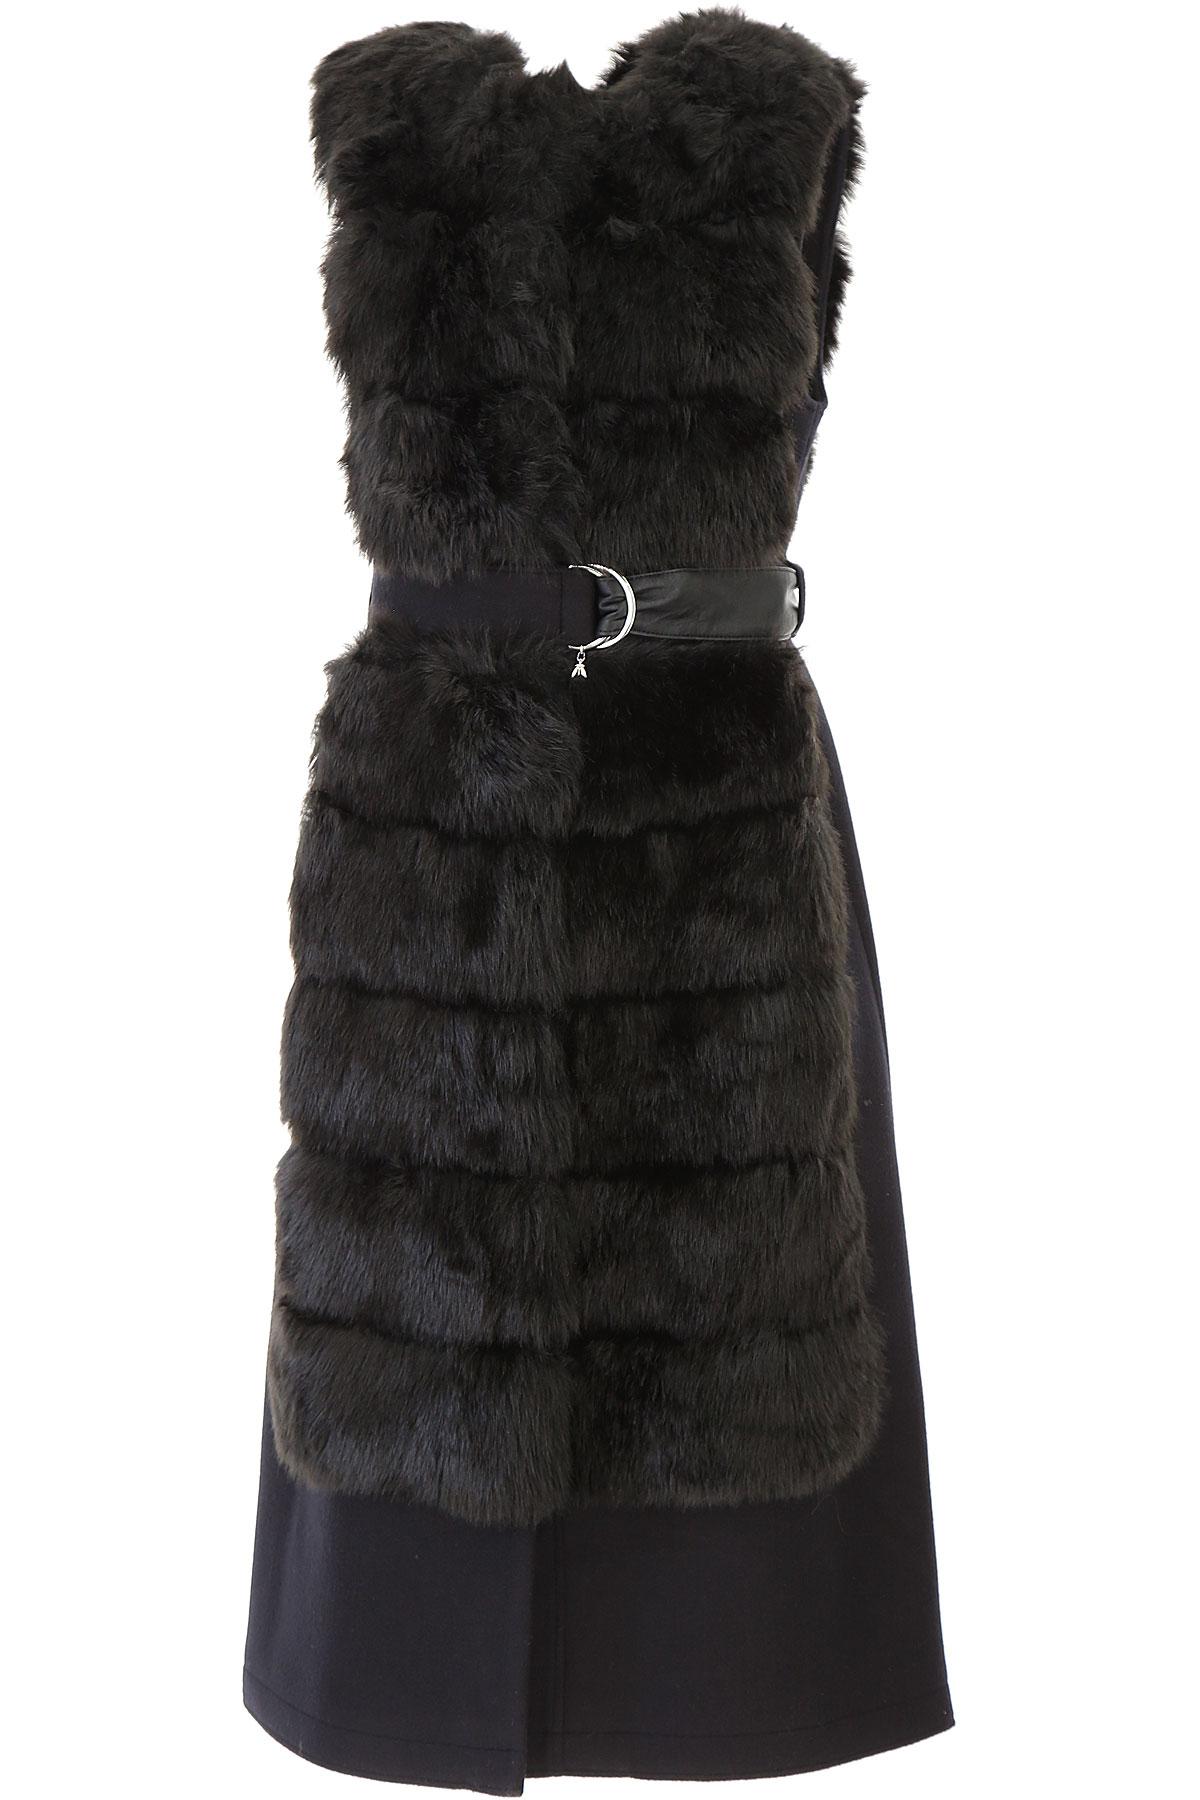 Patrizia Pepe Jacket for Women On Sale, Black, acetate, 2019, 4 6